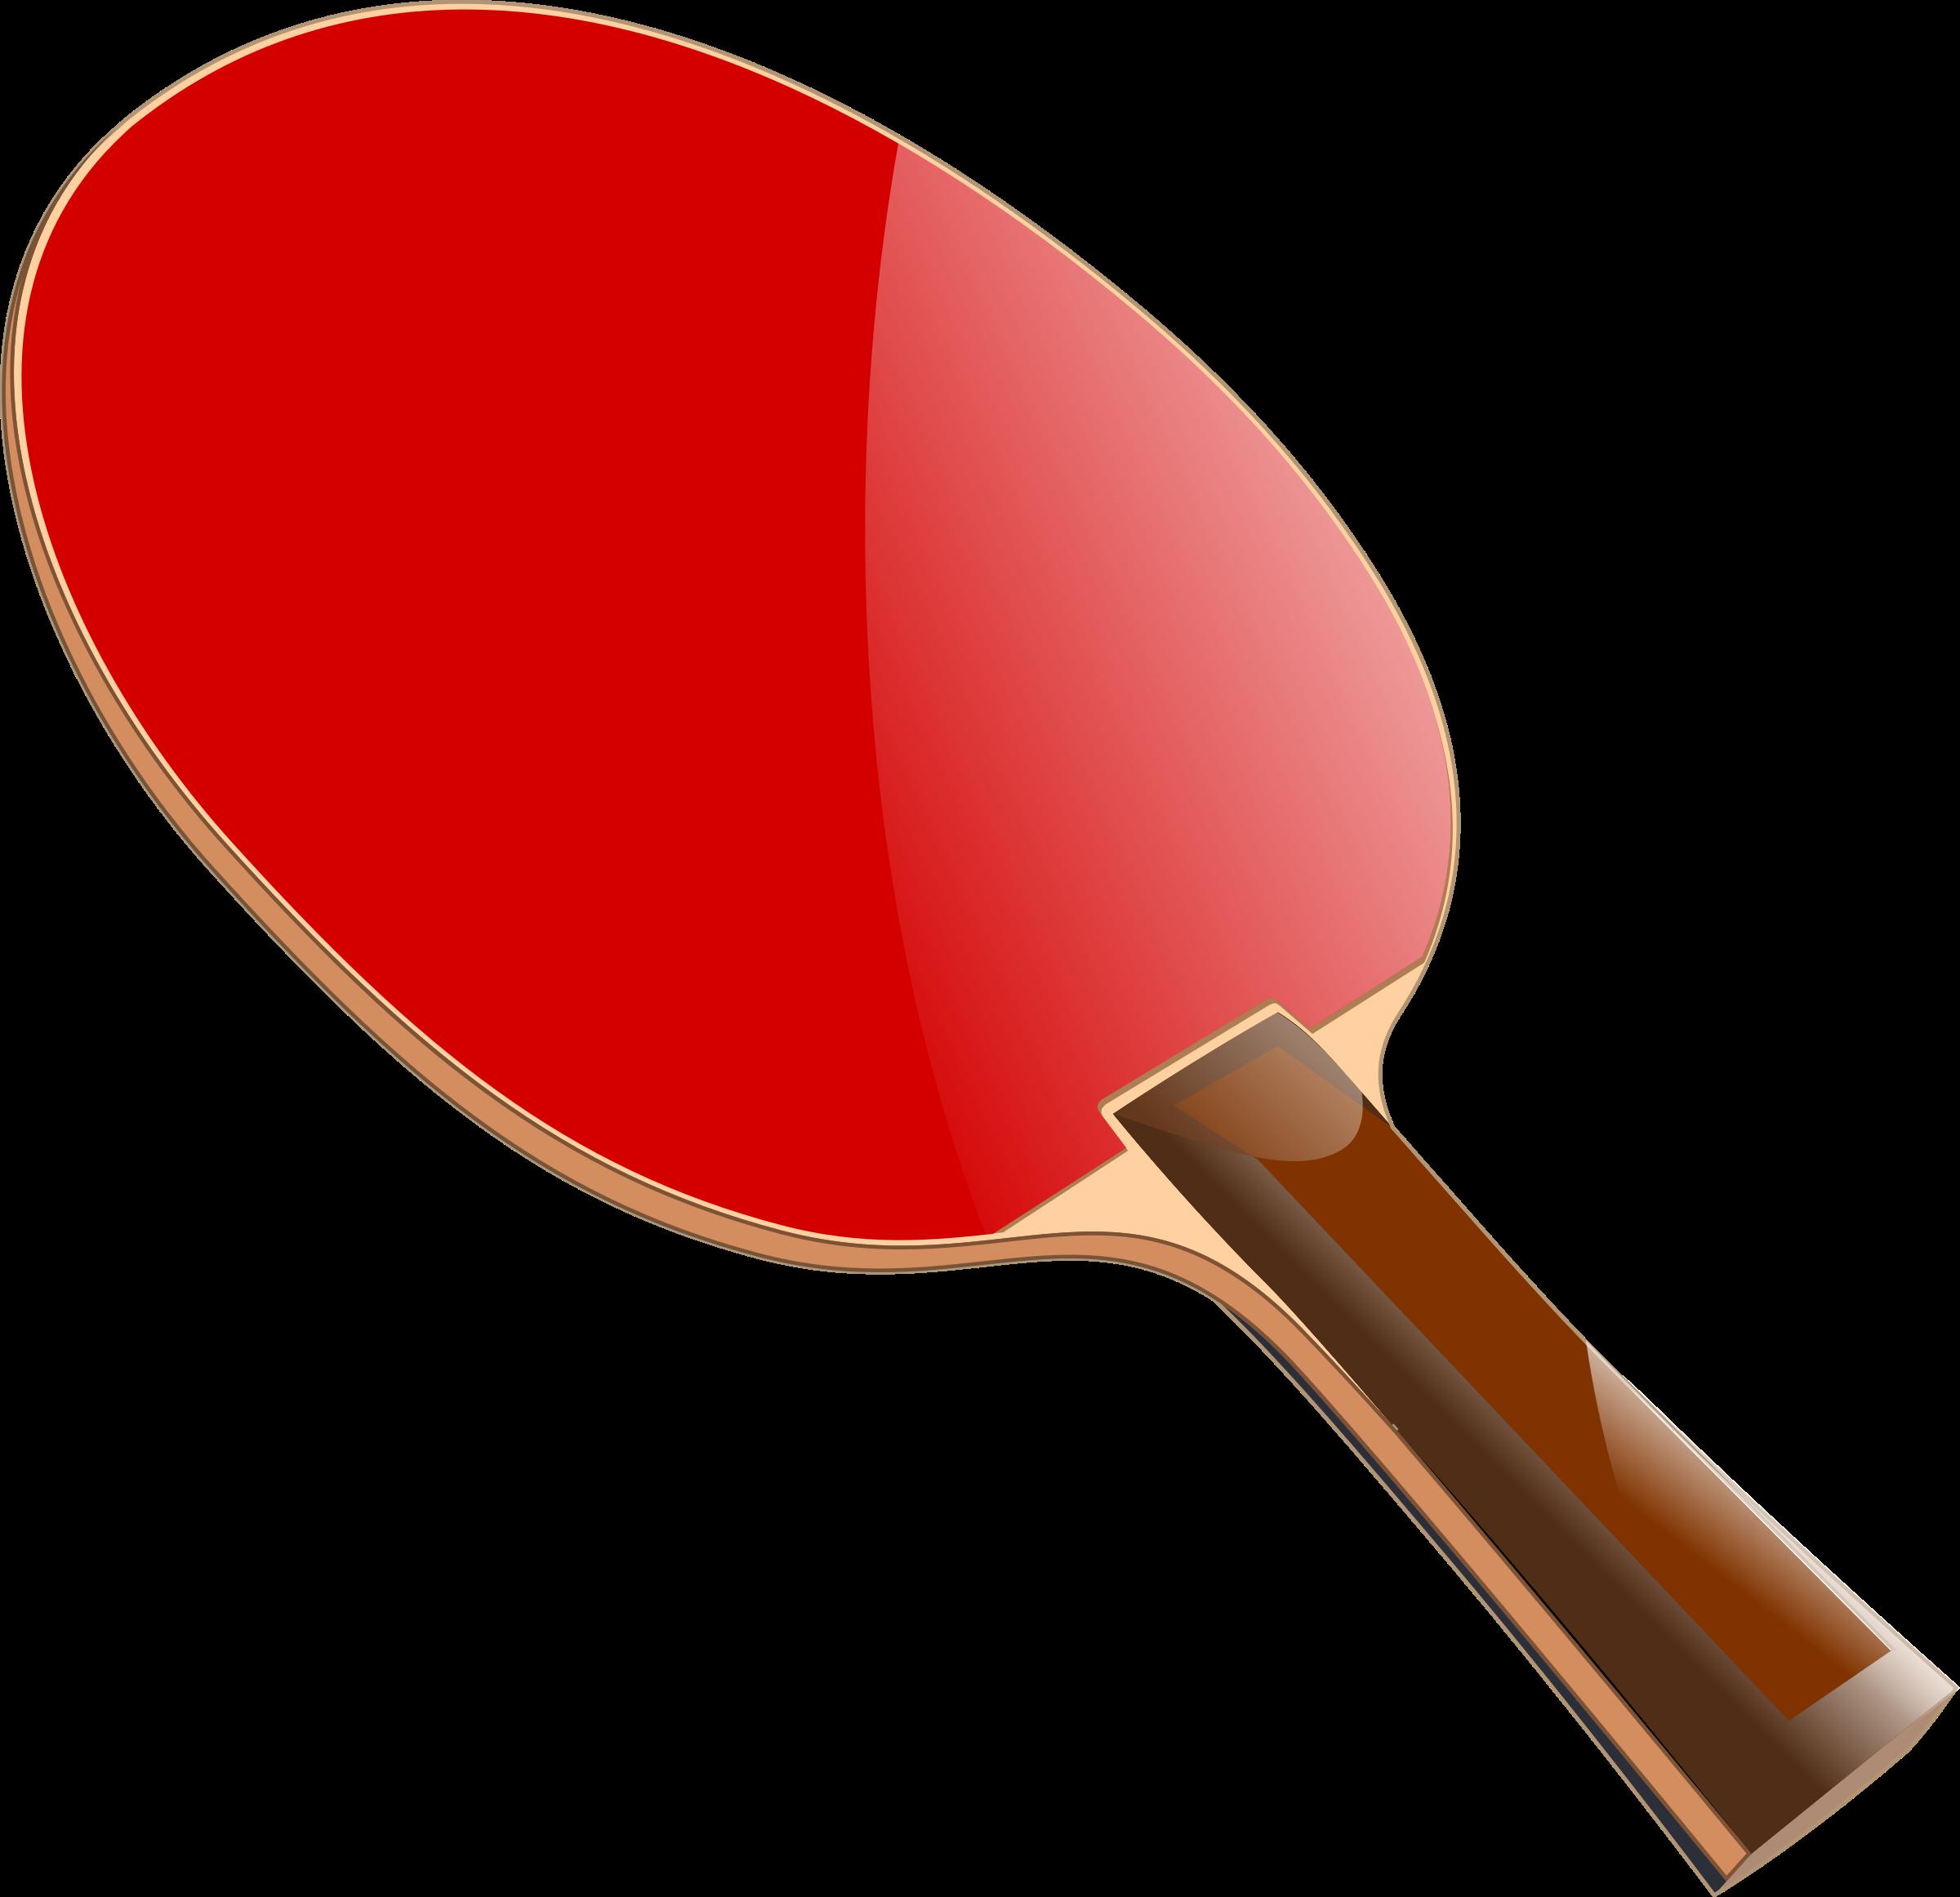 Clipart bat ping pong. Remix big image png